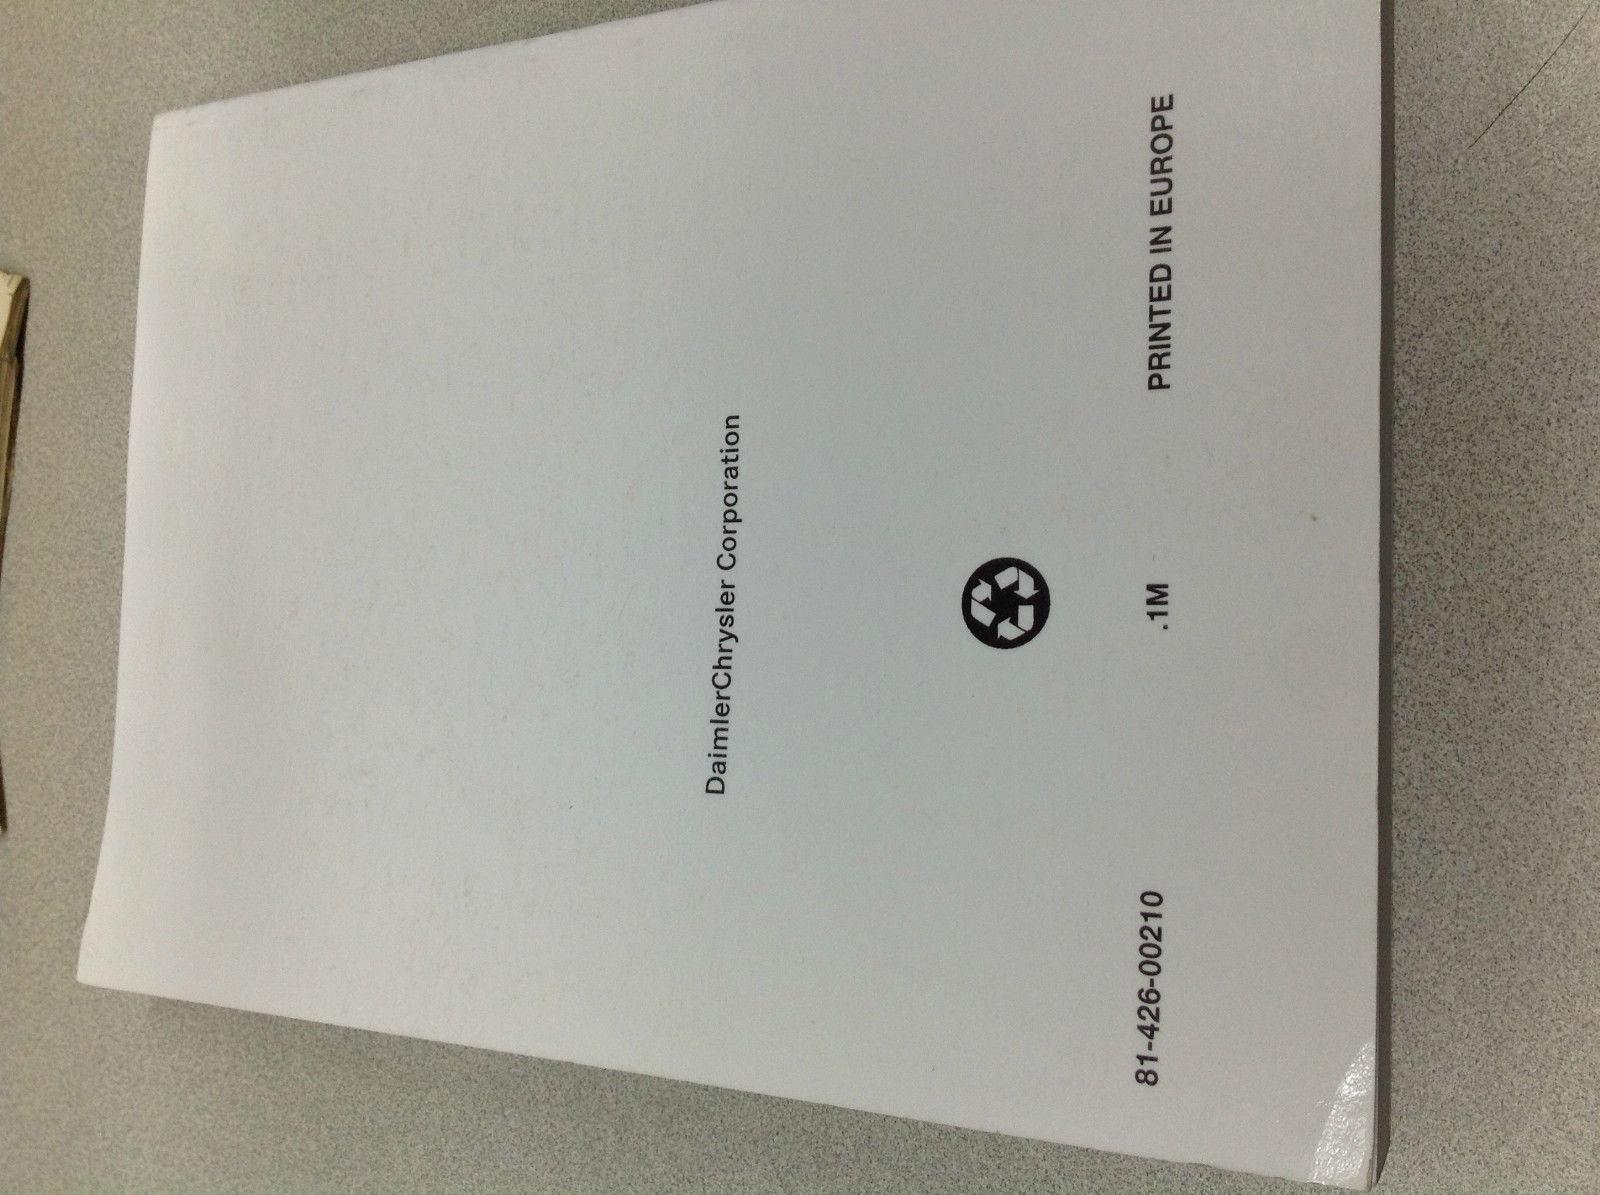 2000 Chrysler Dodge Stratus Shop Service Repair Manual SUPPLEMENT OEM MOPAR